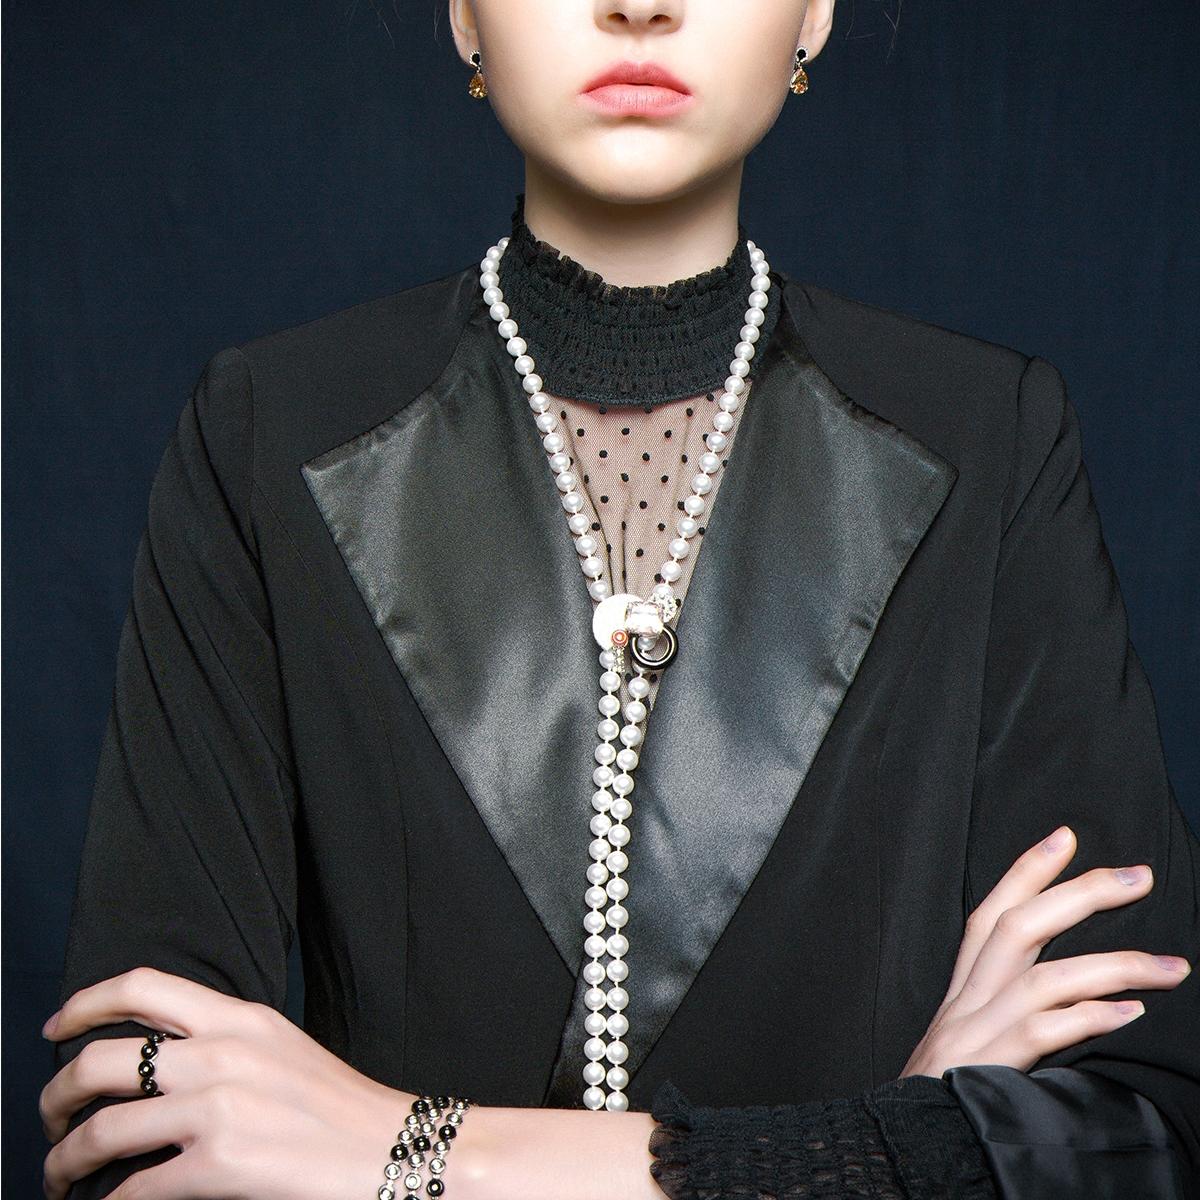 CASSIEVONG/诗无 旭和胸针、项链两戴 欧美风设计 原创轻奢限量款